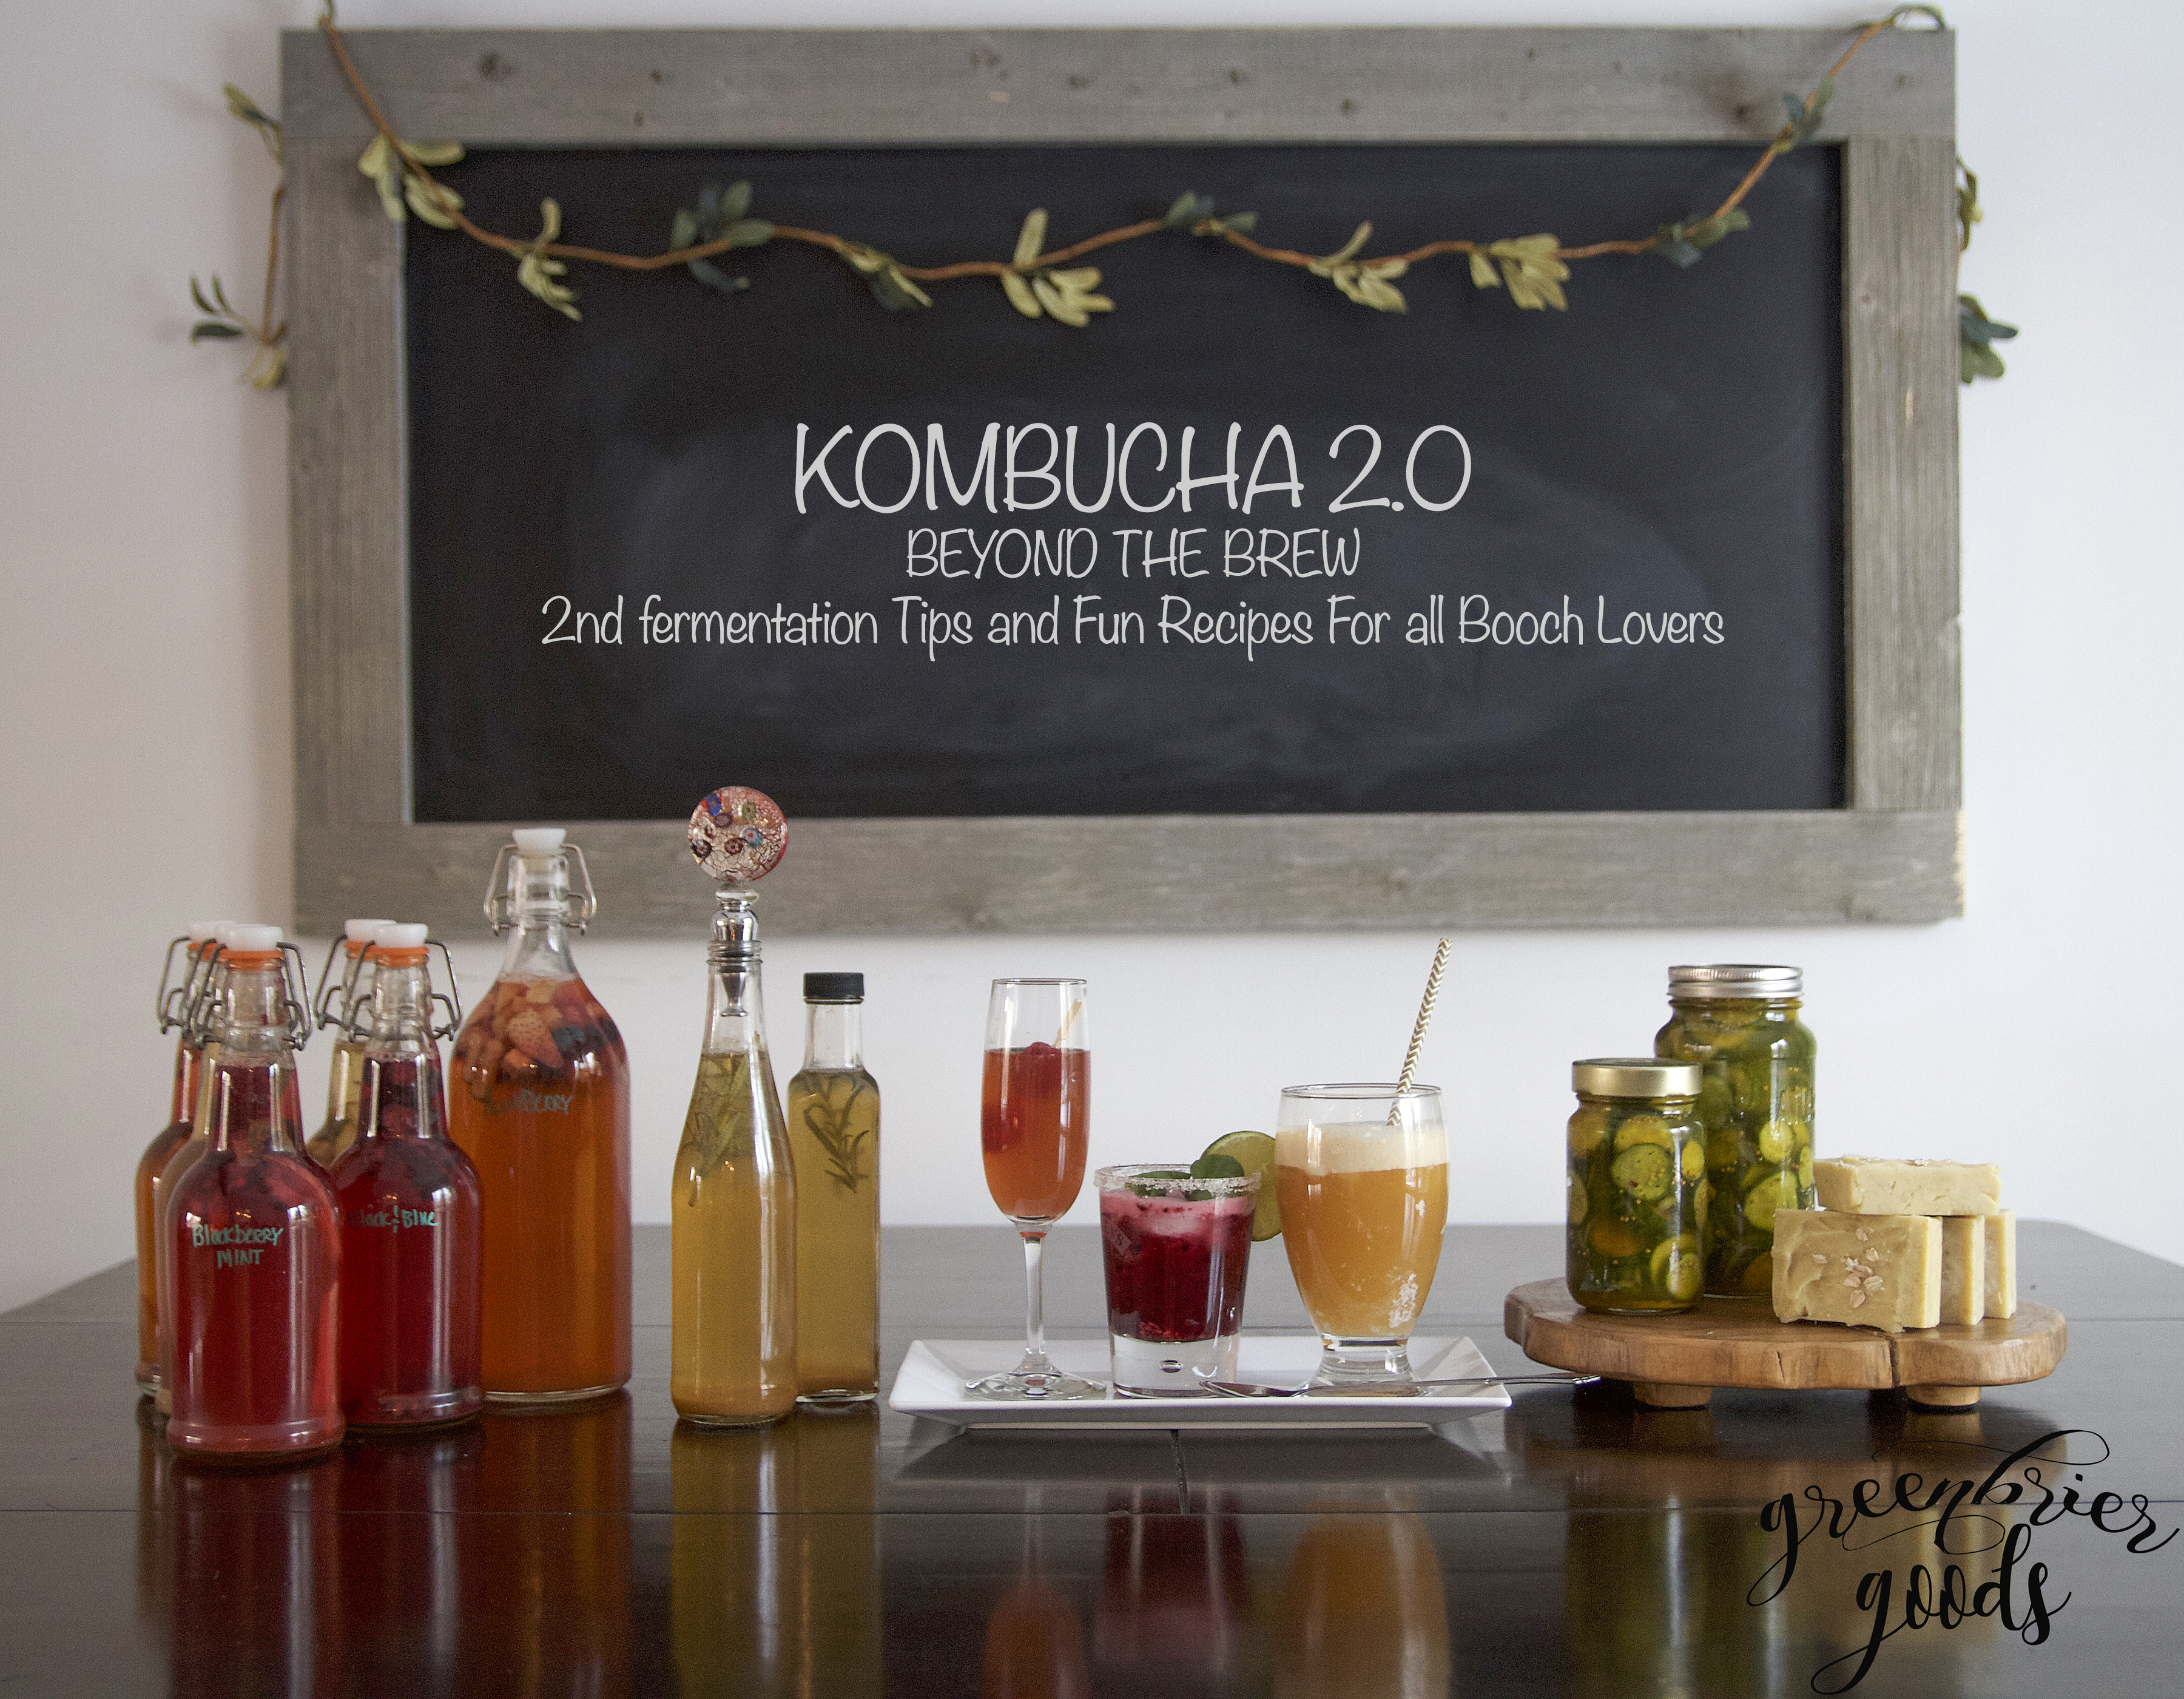 Kombucha workshop: Level 2 beyond the brew